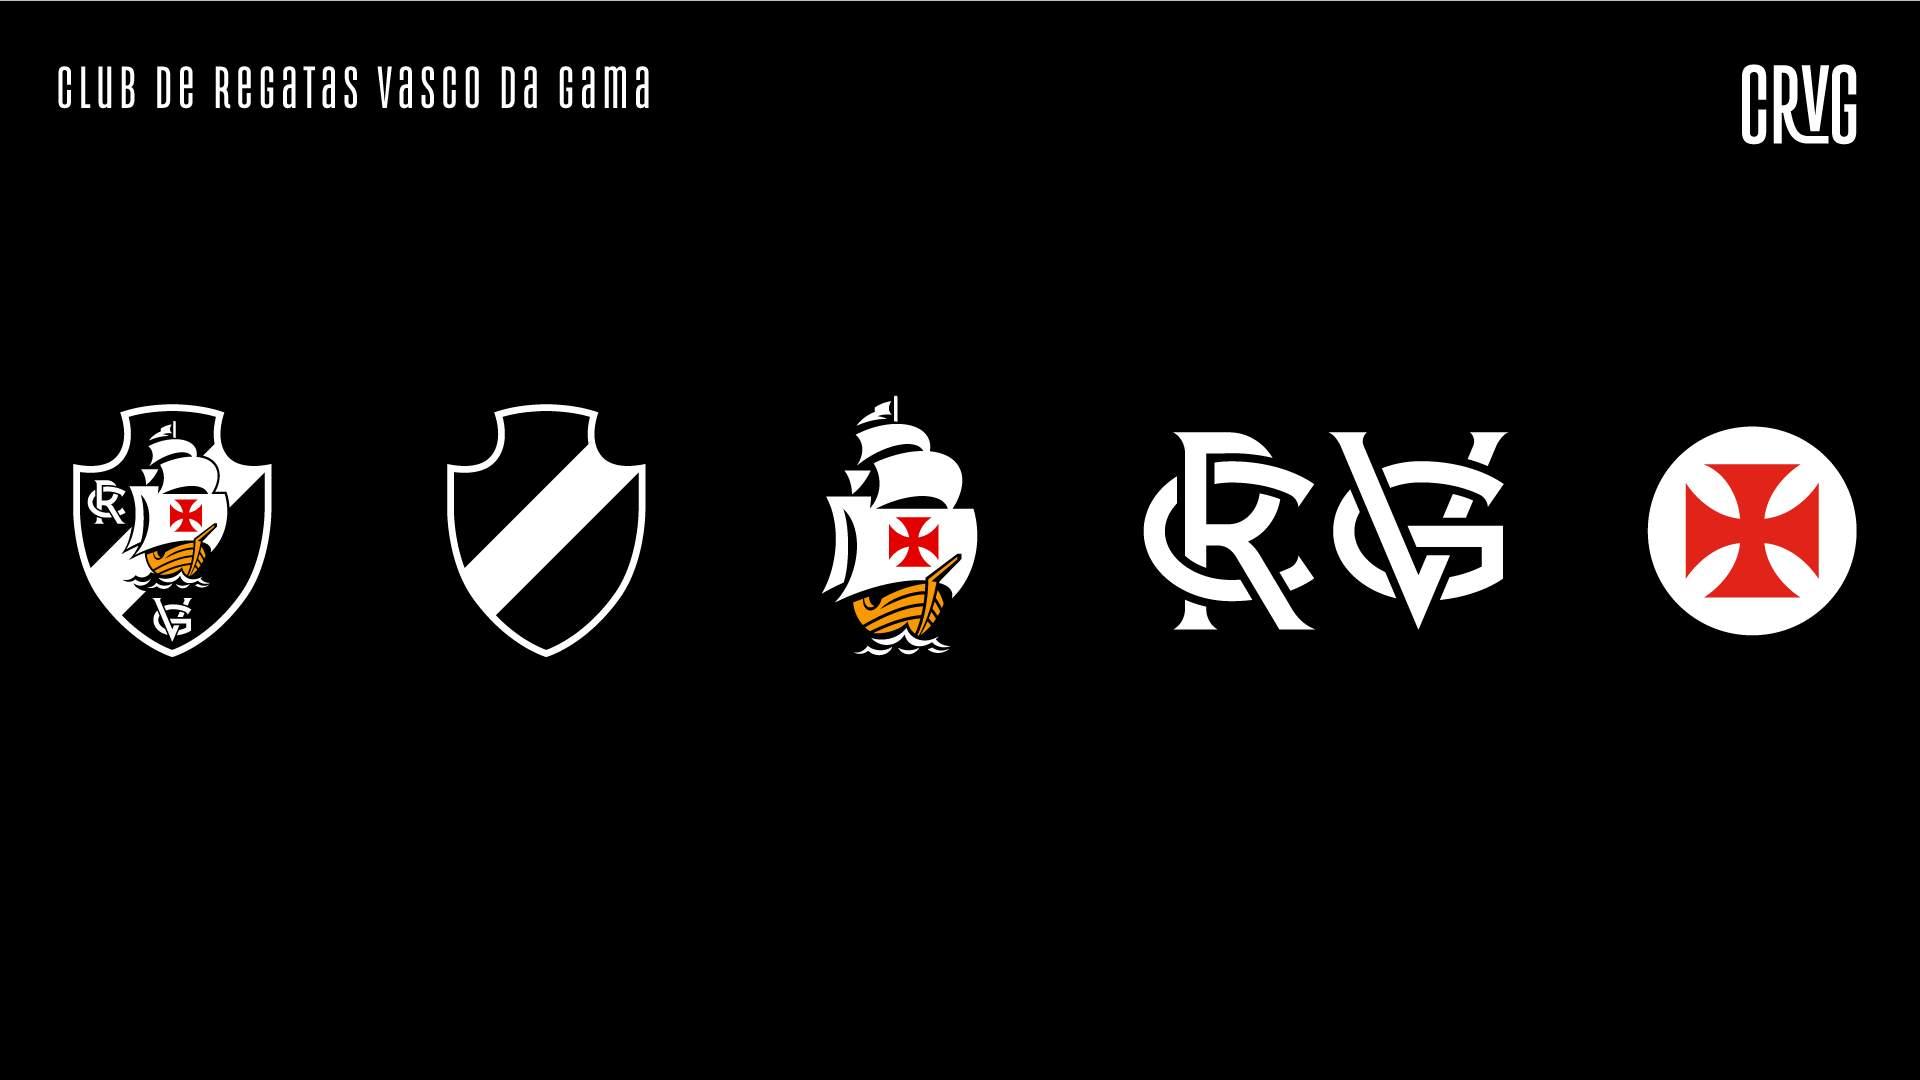 Nuevos símbolos del Vasco Da Gama